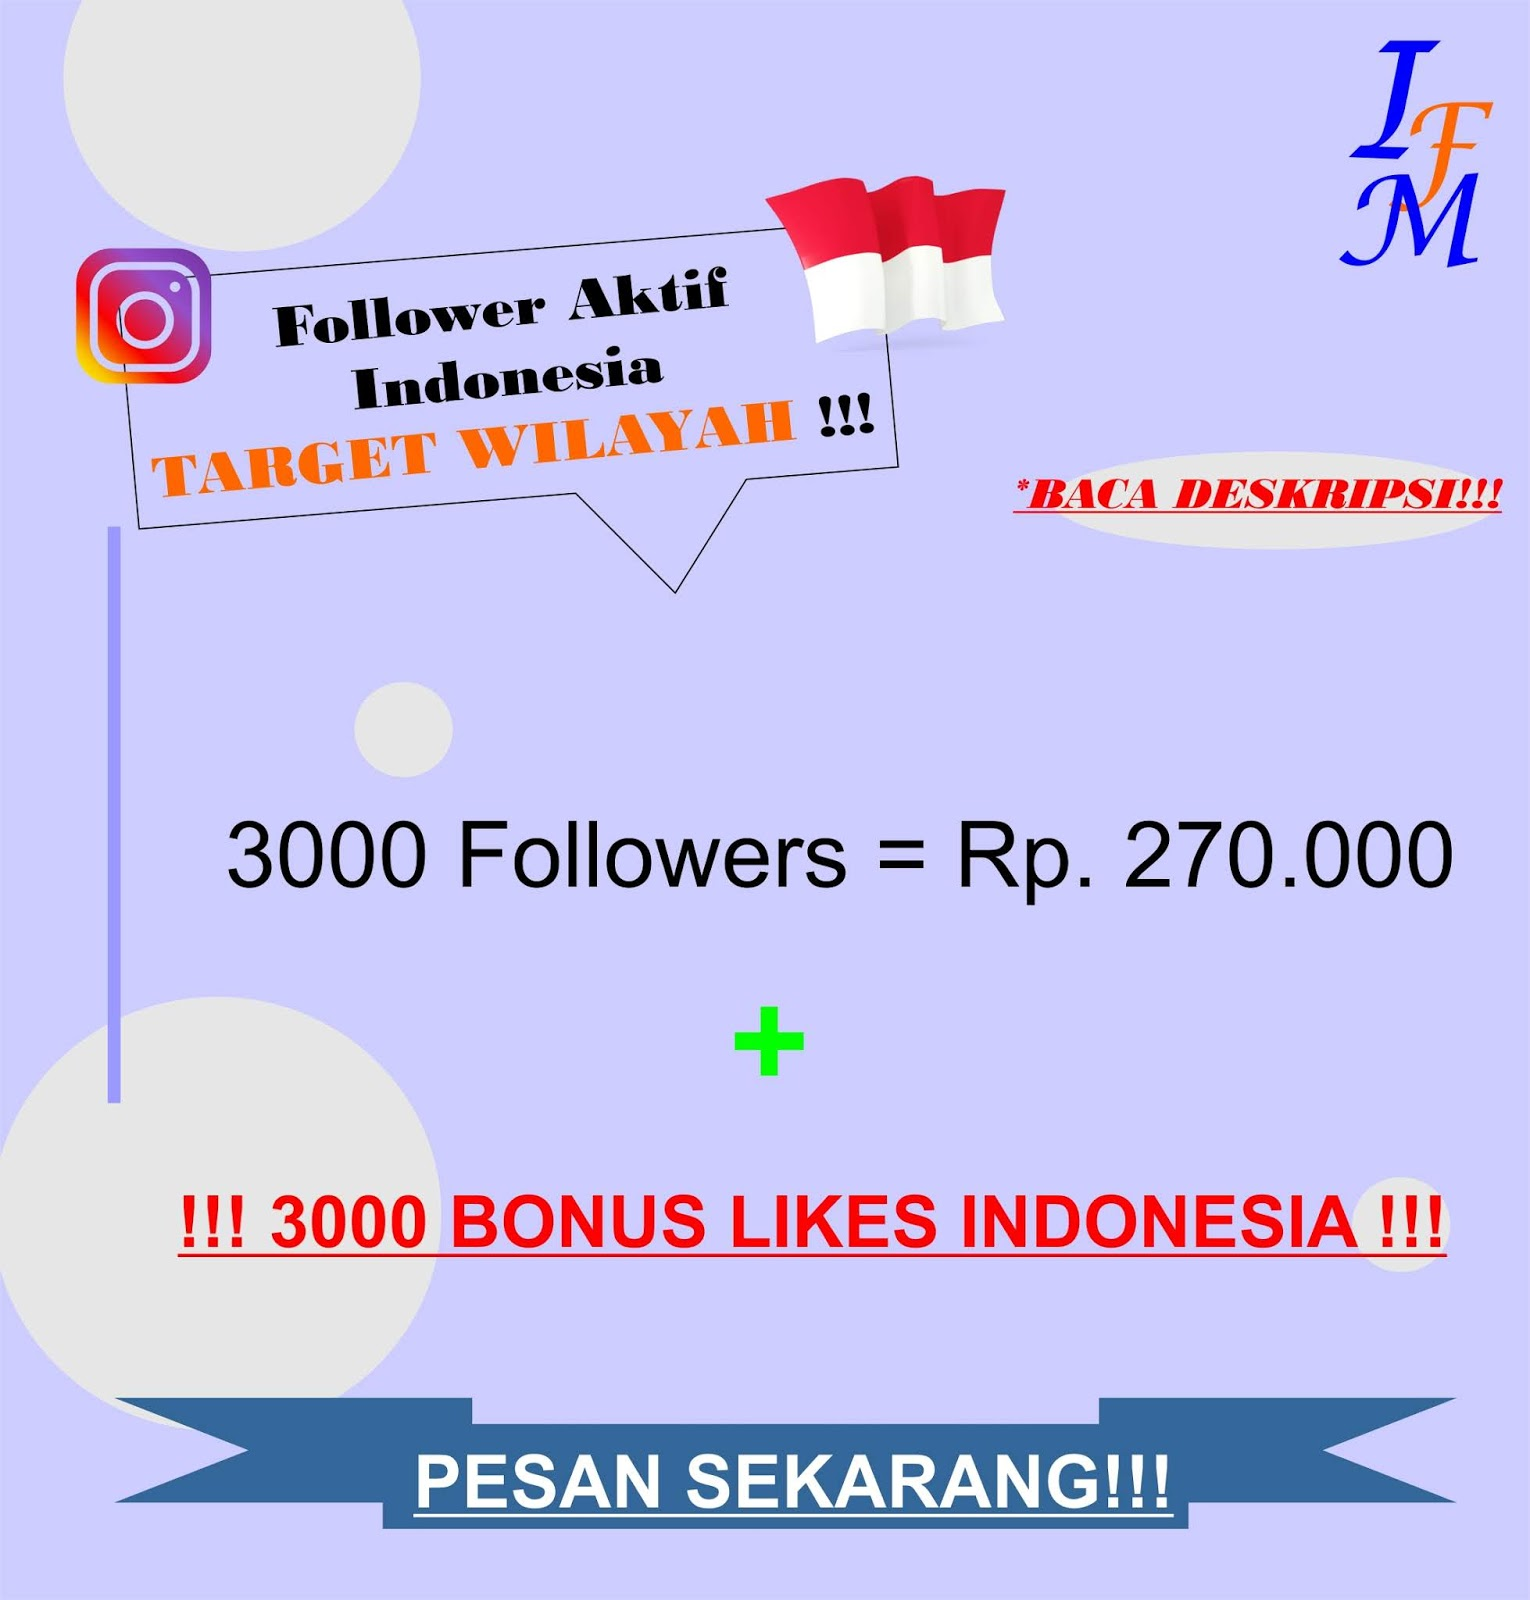 Jasa Tambah 3000 Follower Akun Instagram Aktif Indonesia Target Wilayah Murah